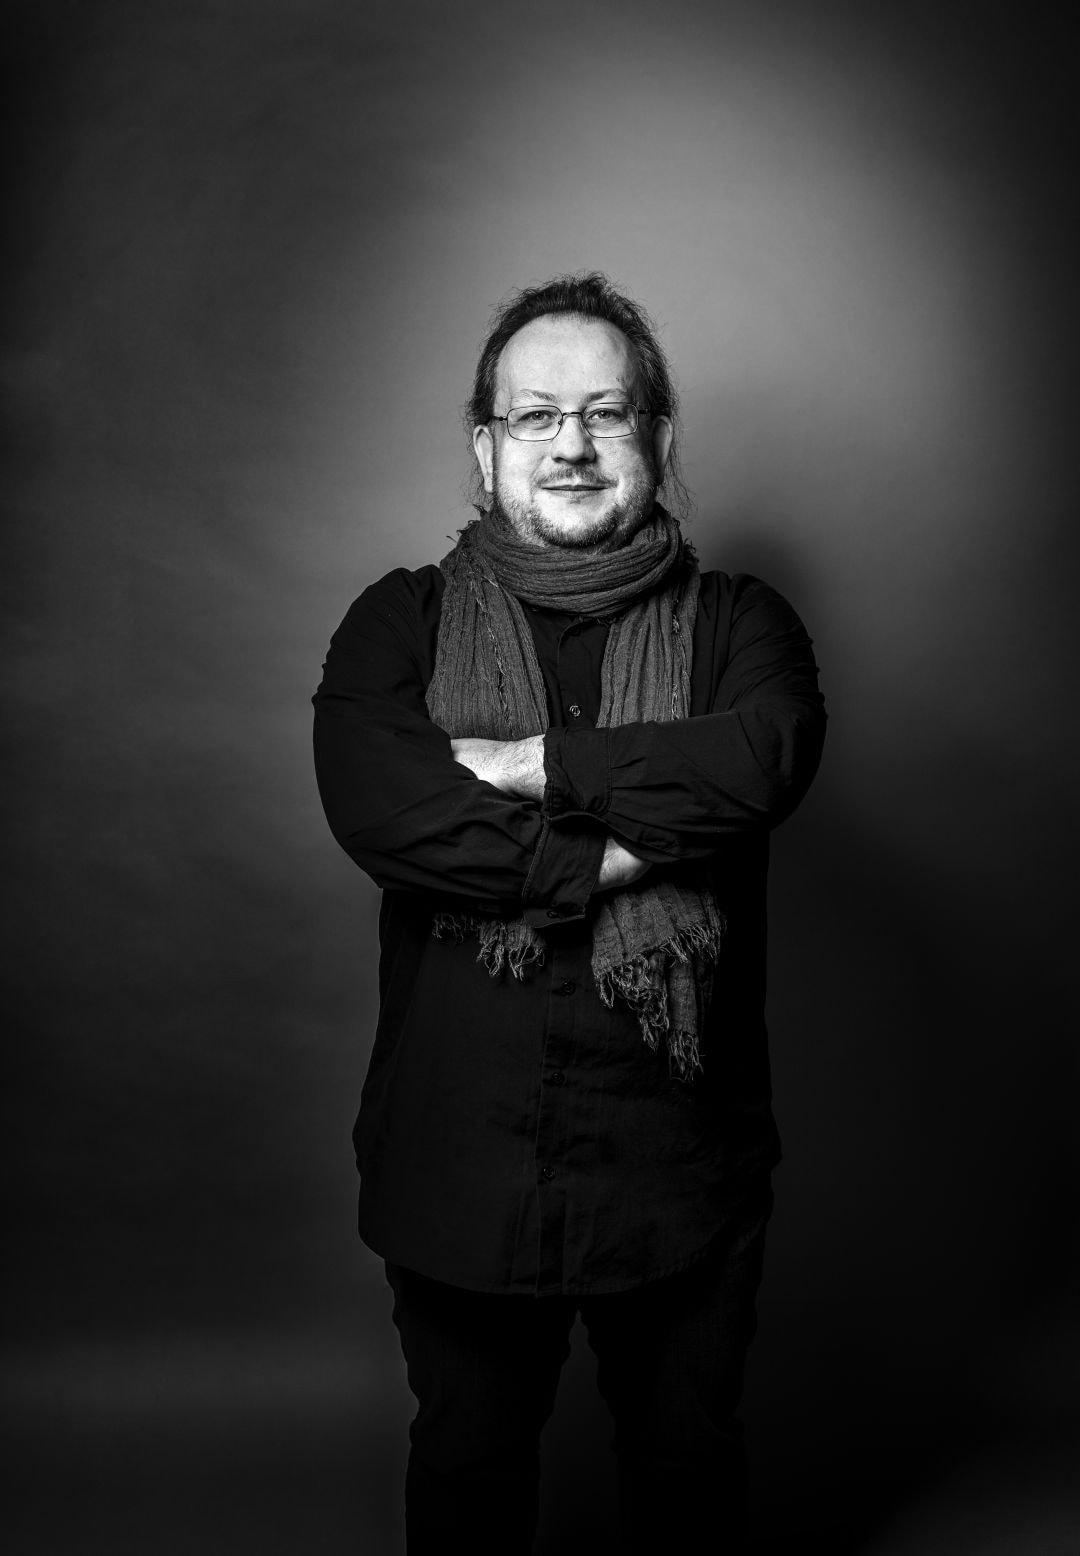 Andreas Rammig